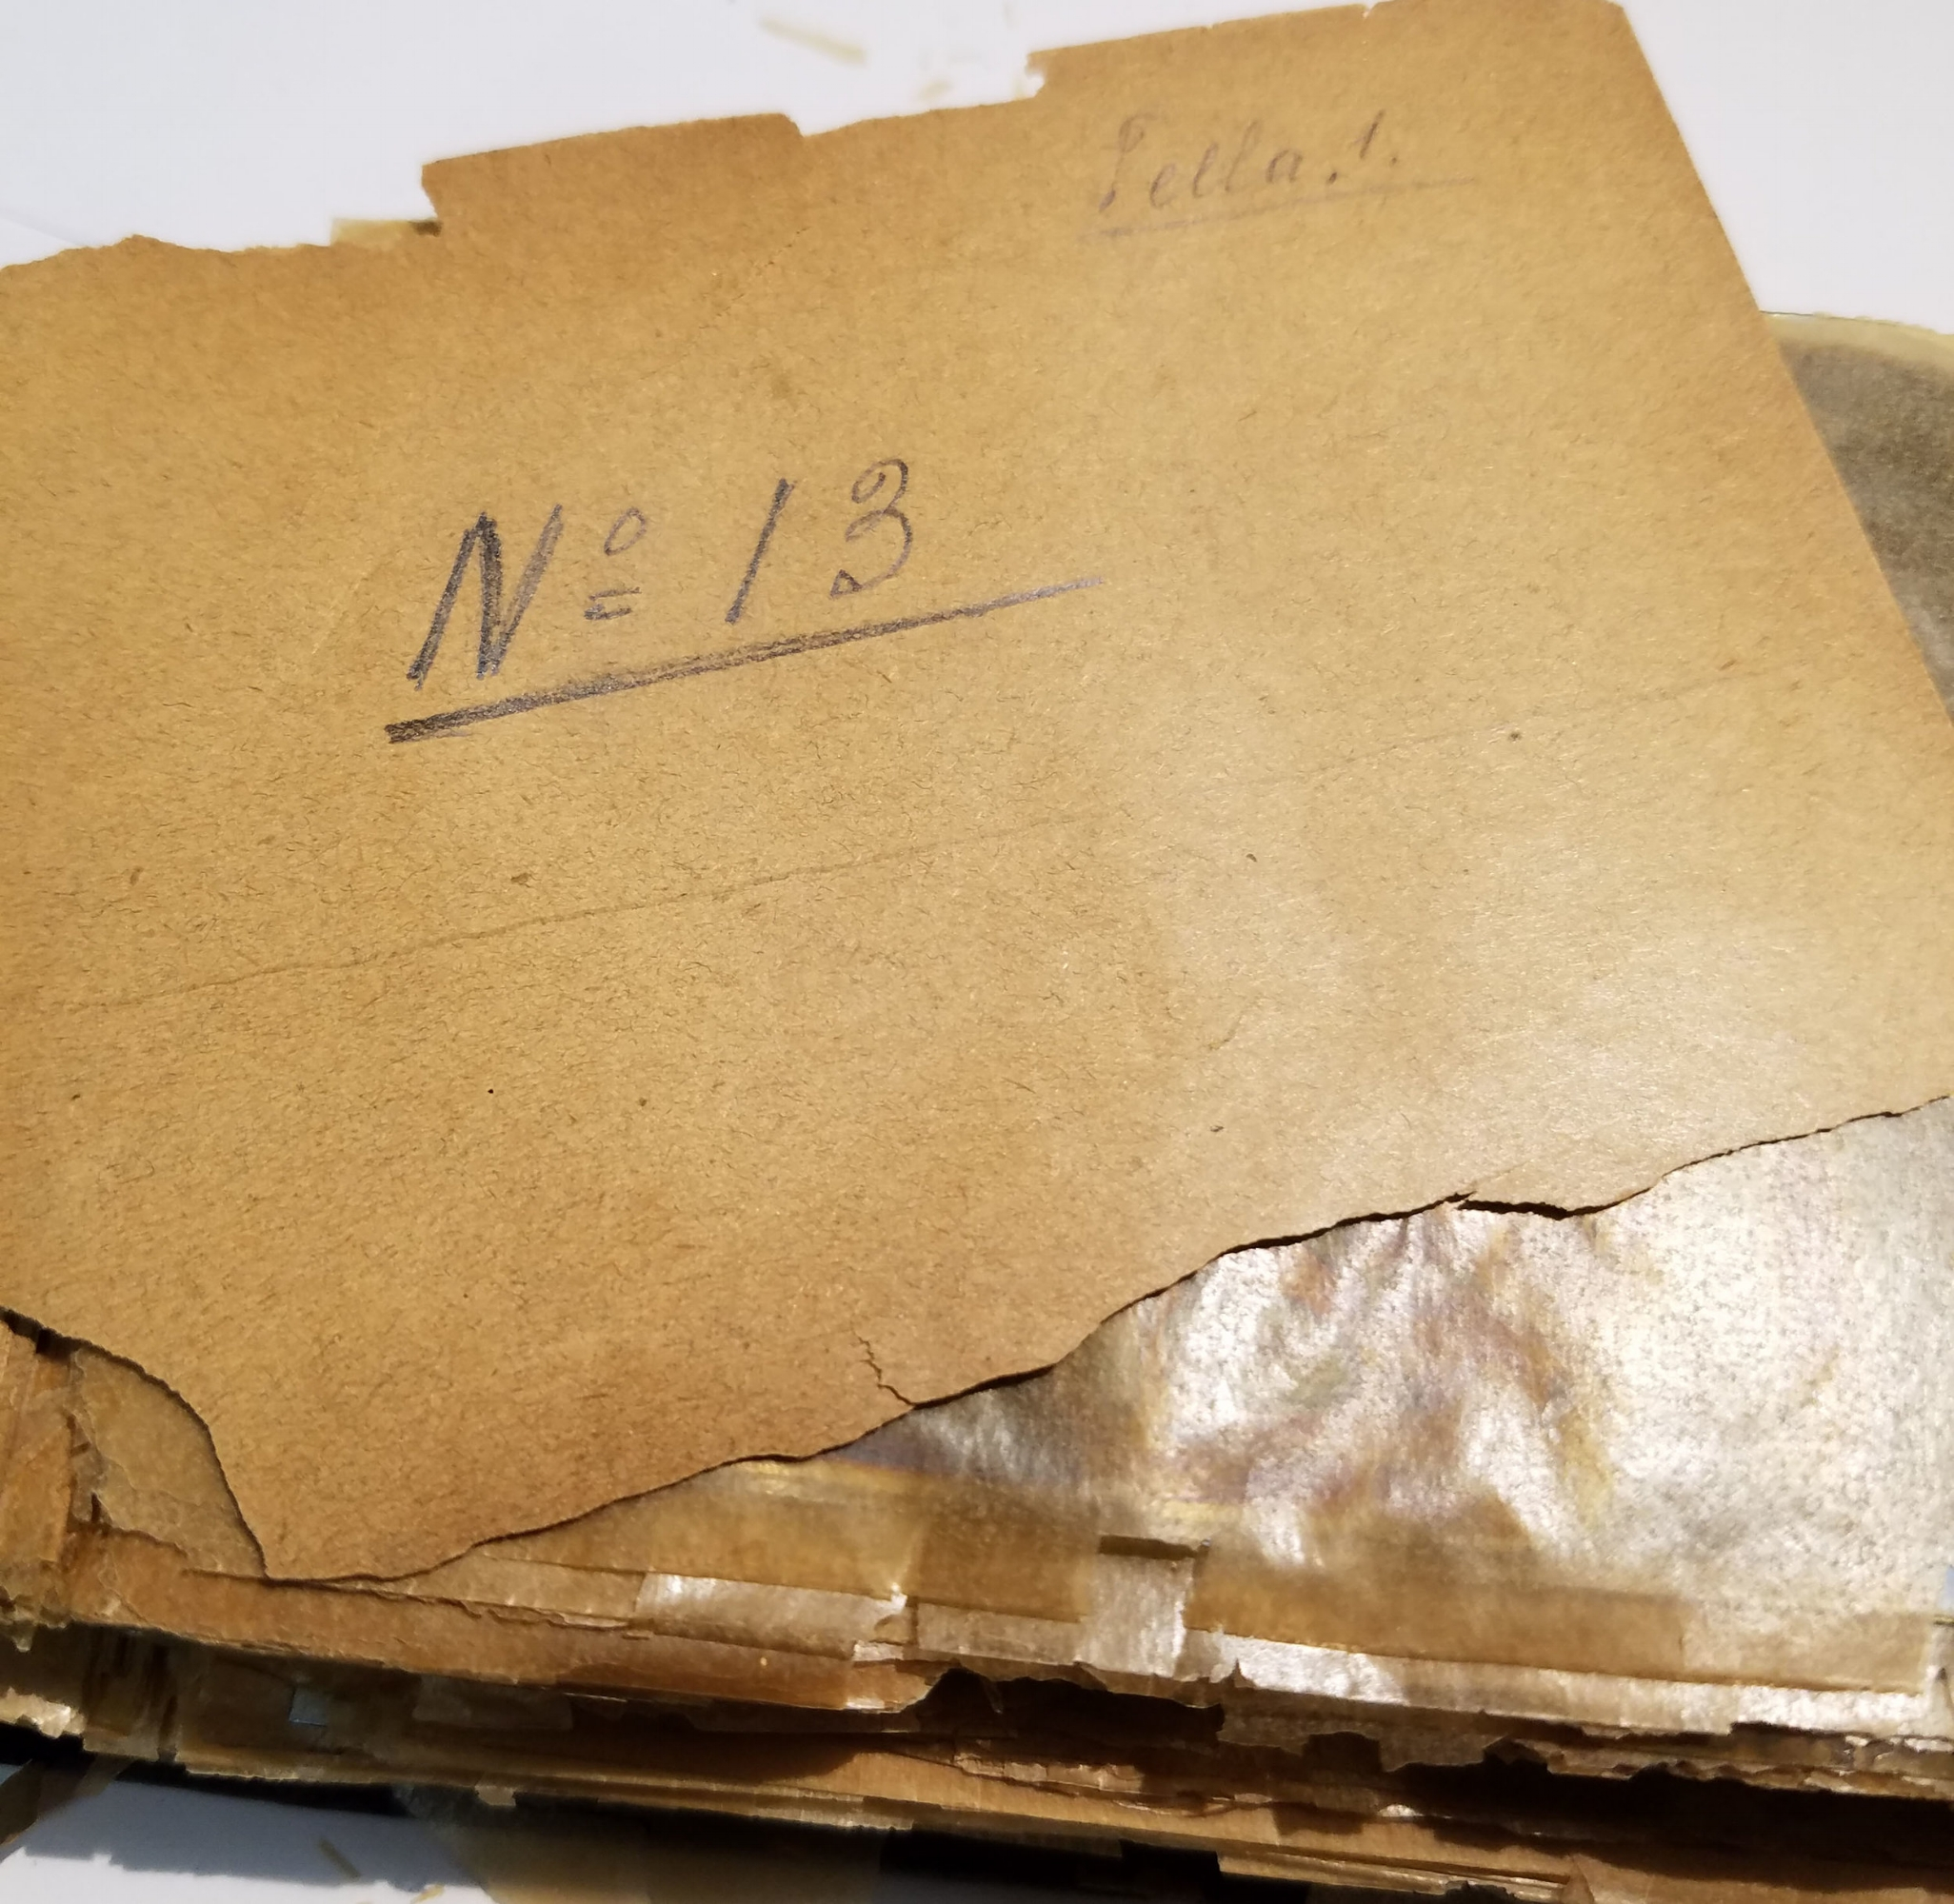 An album of nitrate negatives circa 1900